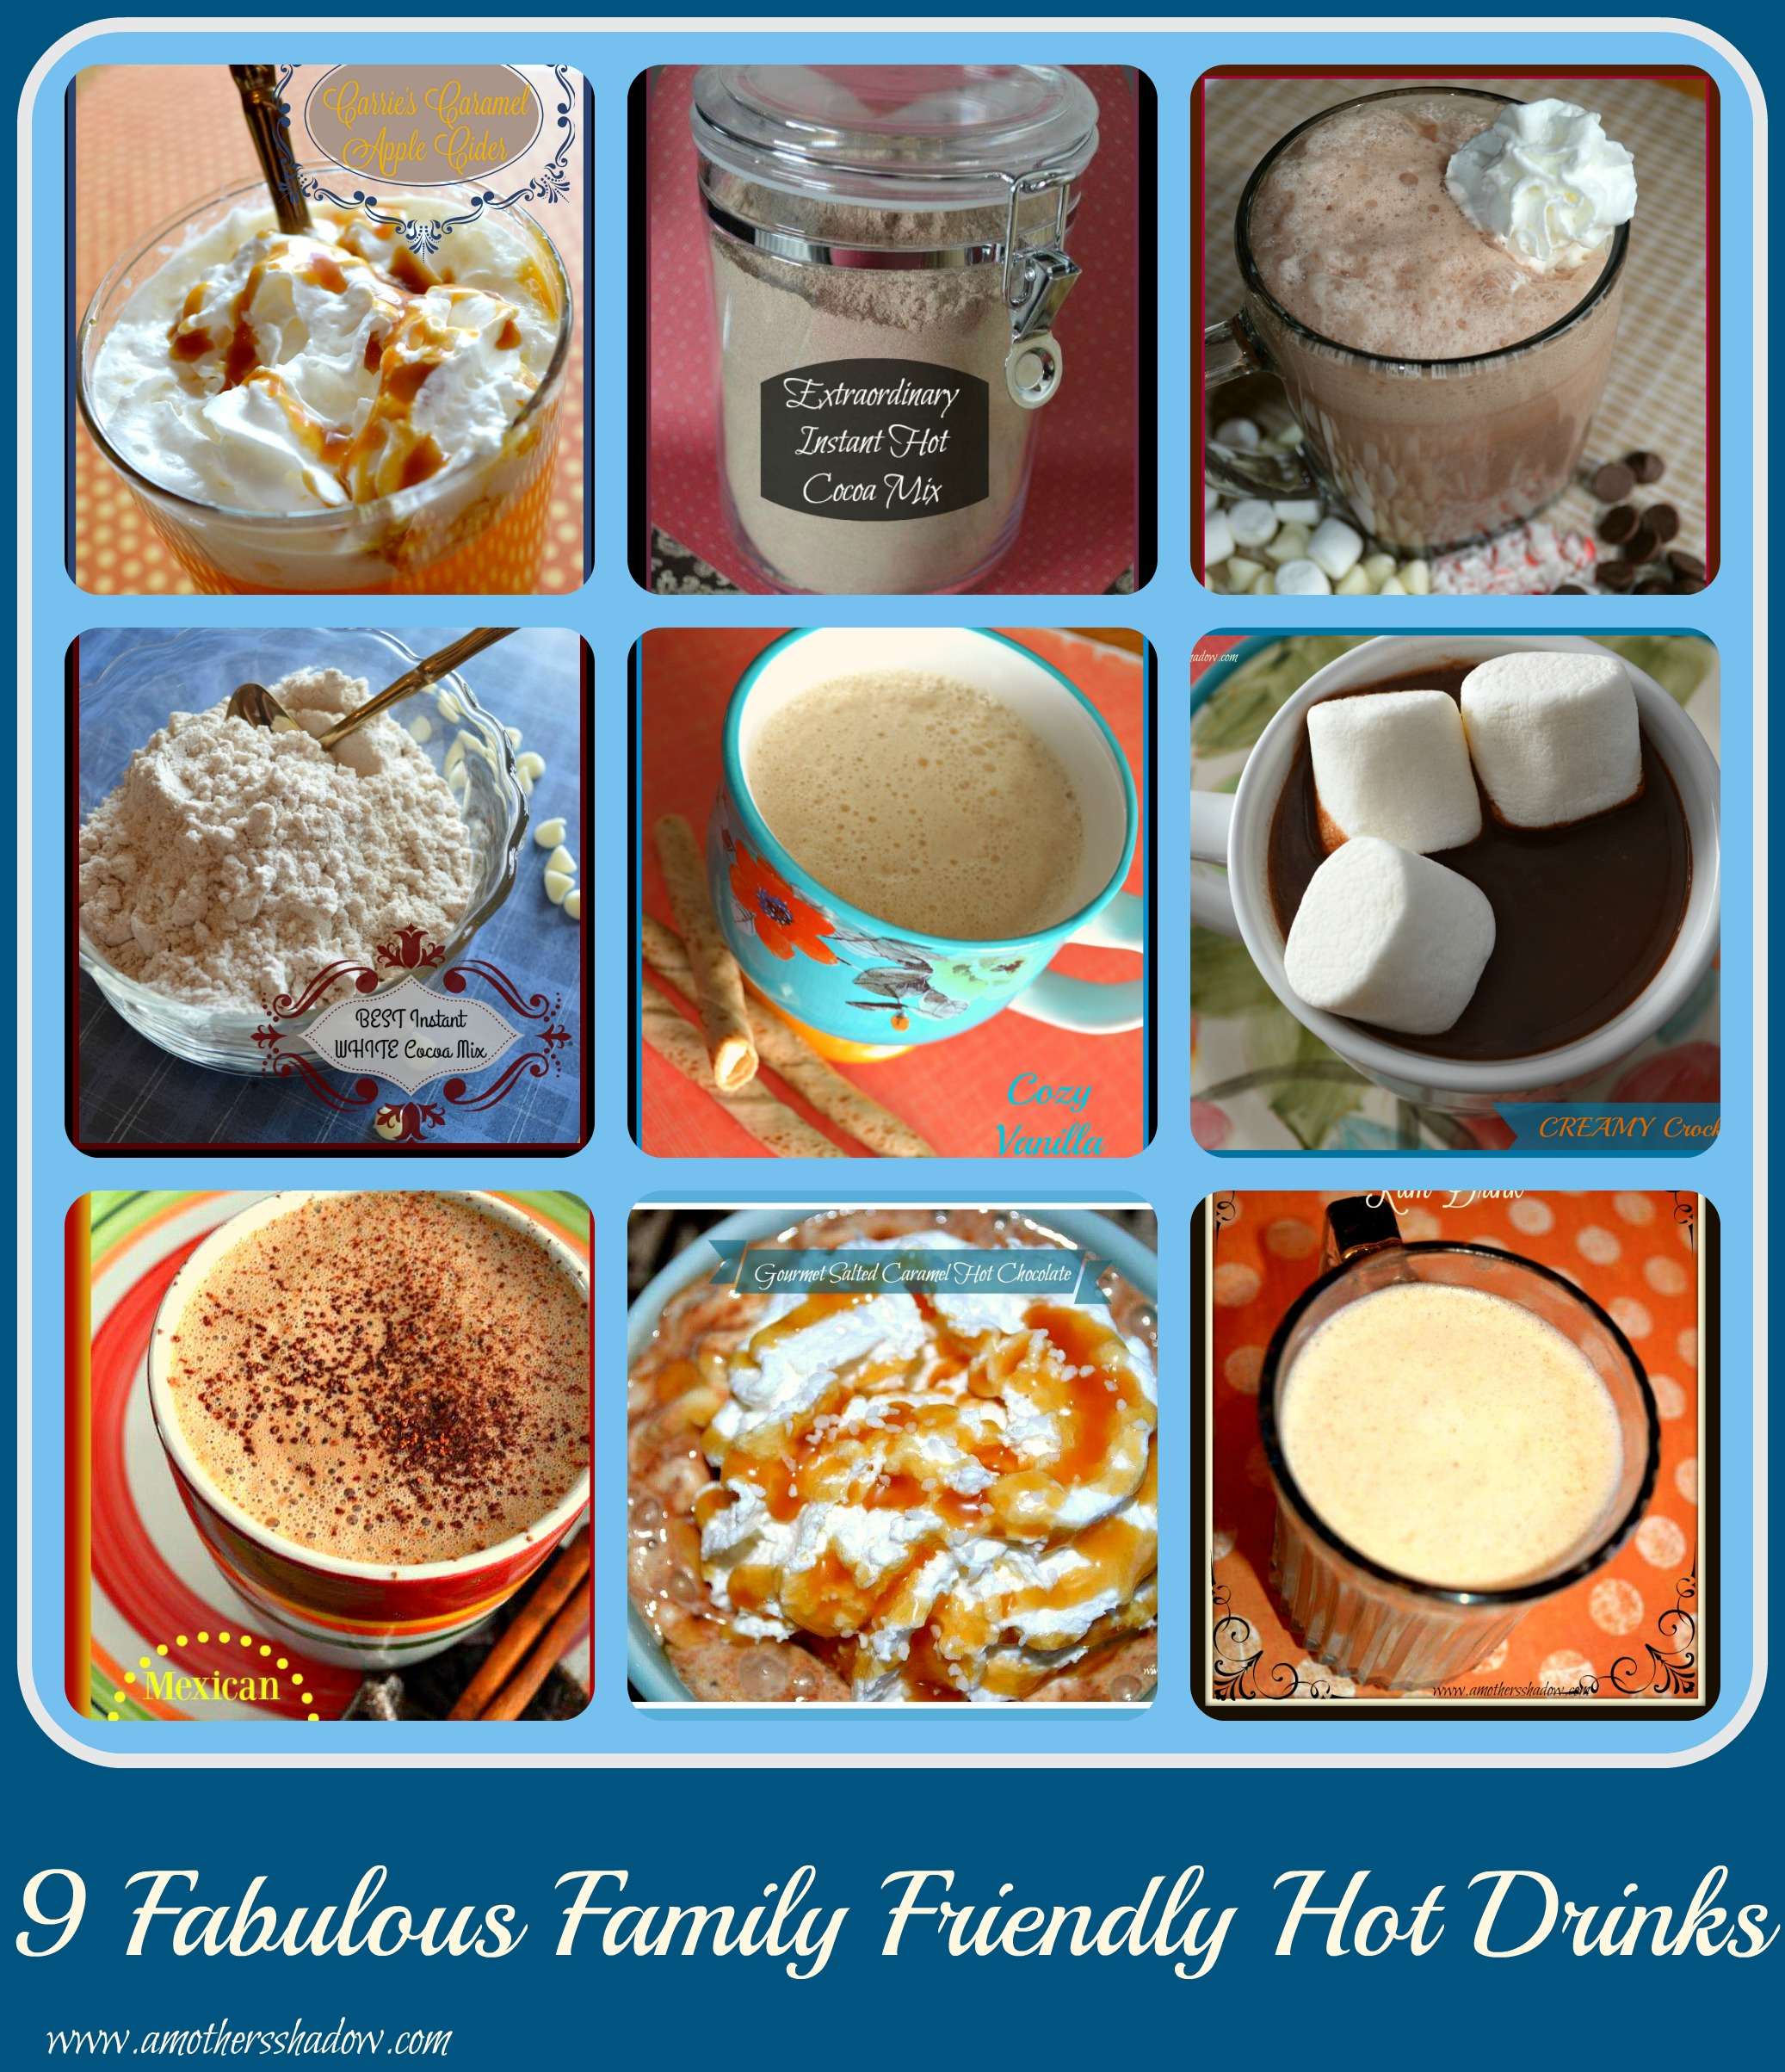 9 Fabulous Family Friendly Hot Drinks